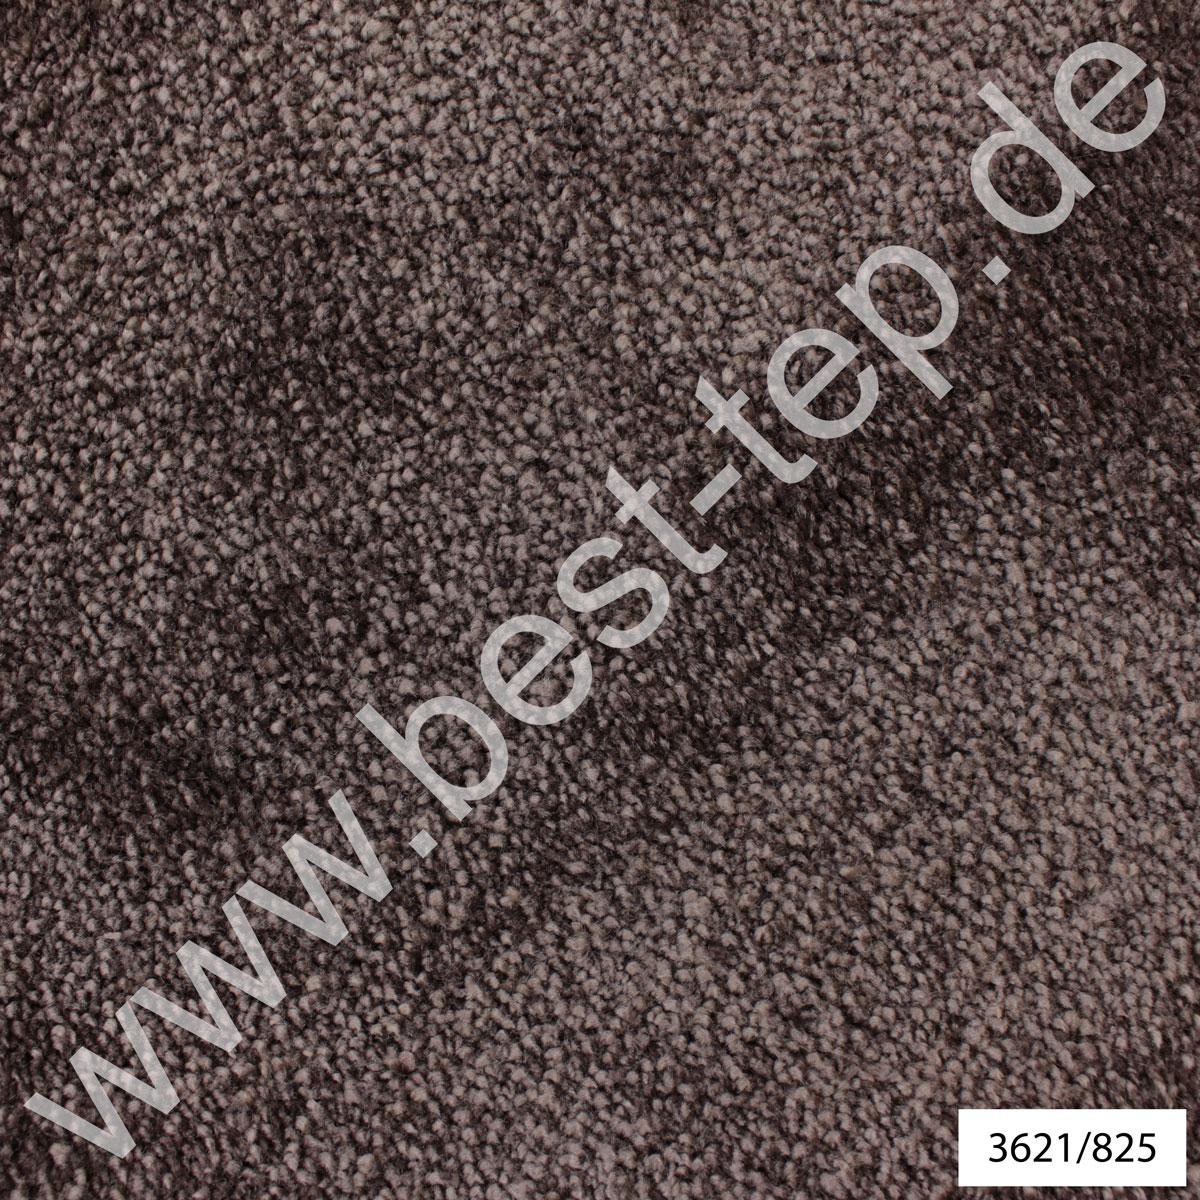 jab anstoetz shop jab anstoetz viva diva teppich 3621 825 online kaufen. Black Bedroom Furniture Sets. Home Design Ideas